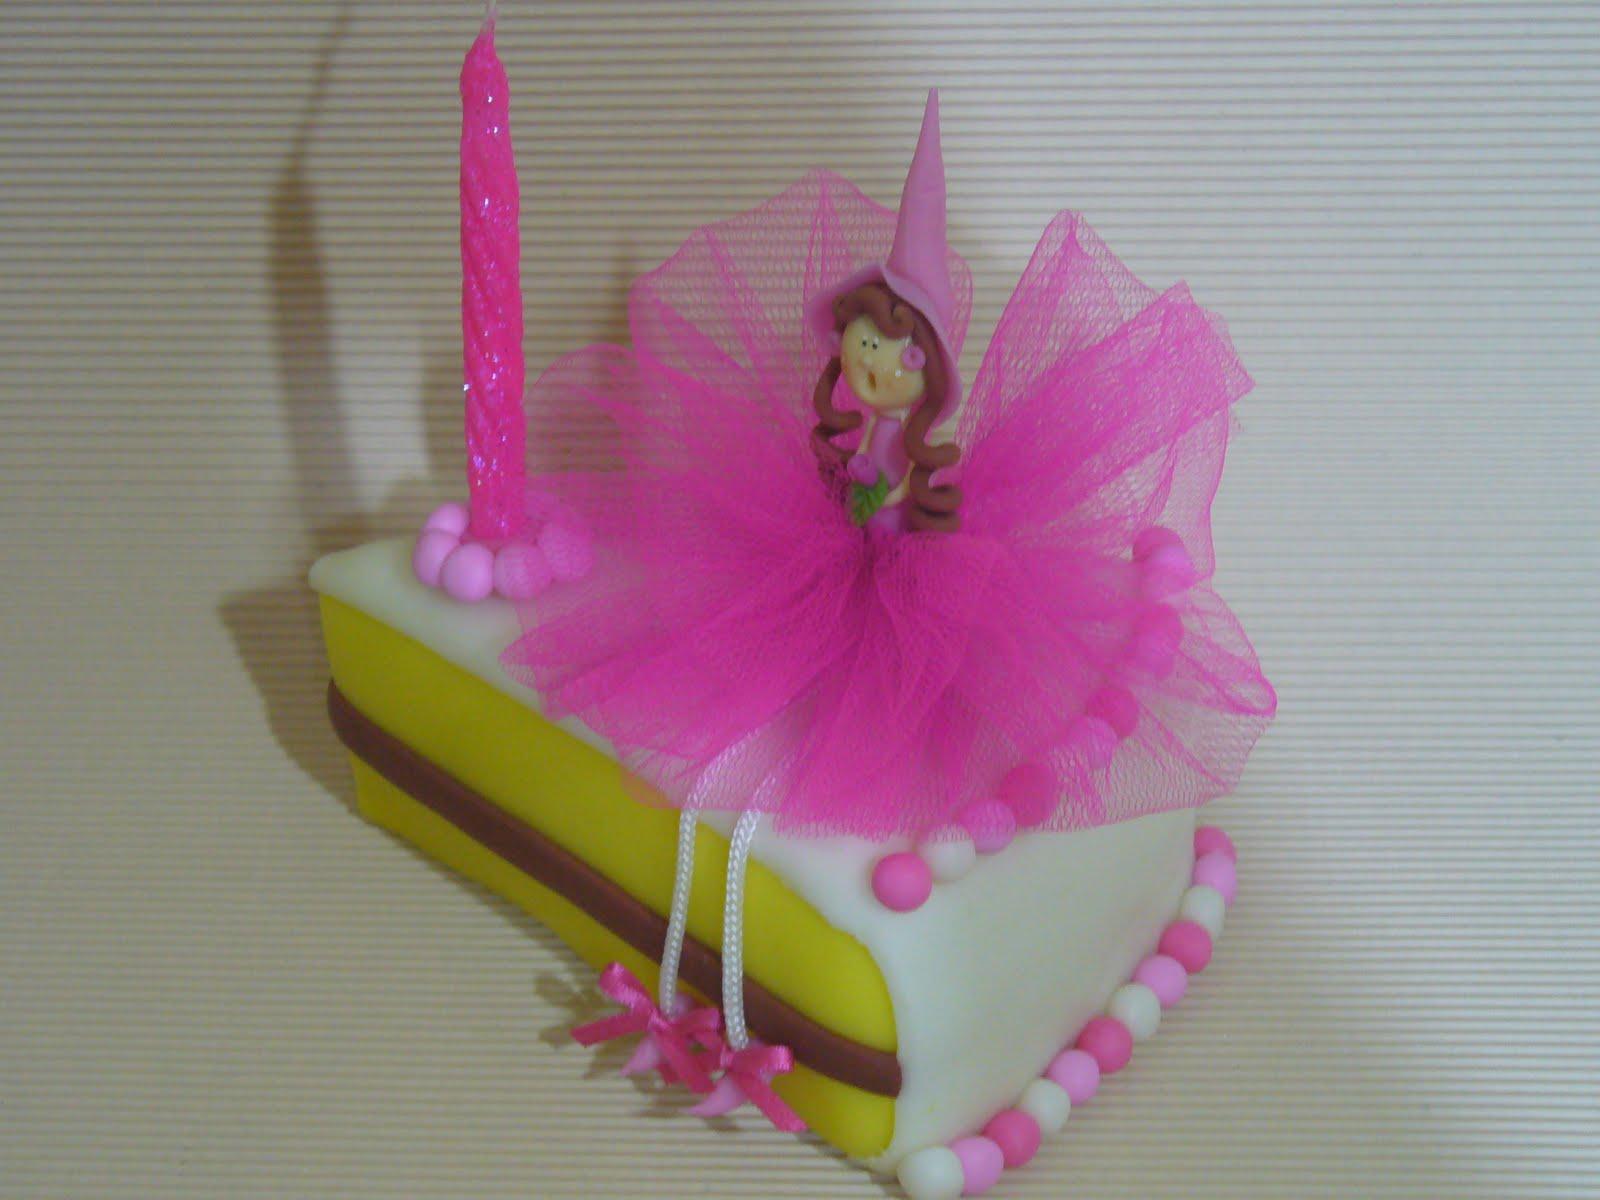 adorno para pastel boda mercadolibre pictures pelauts